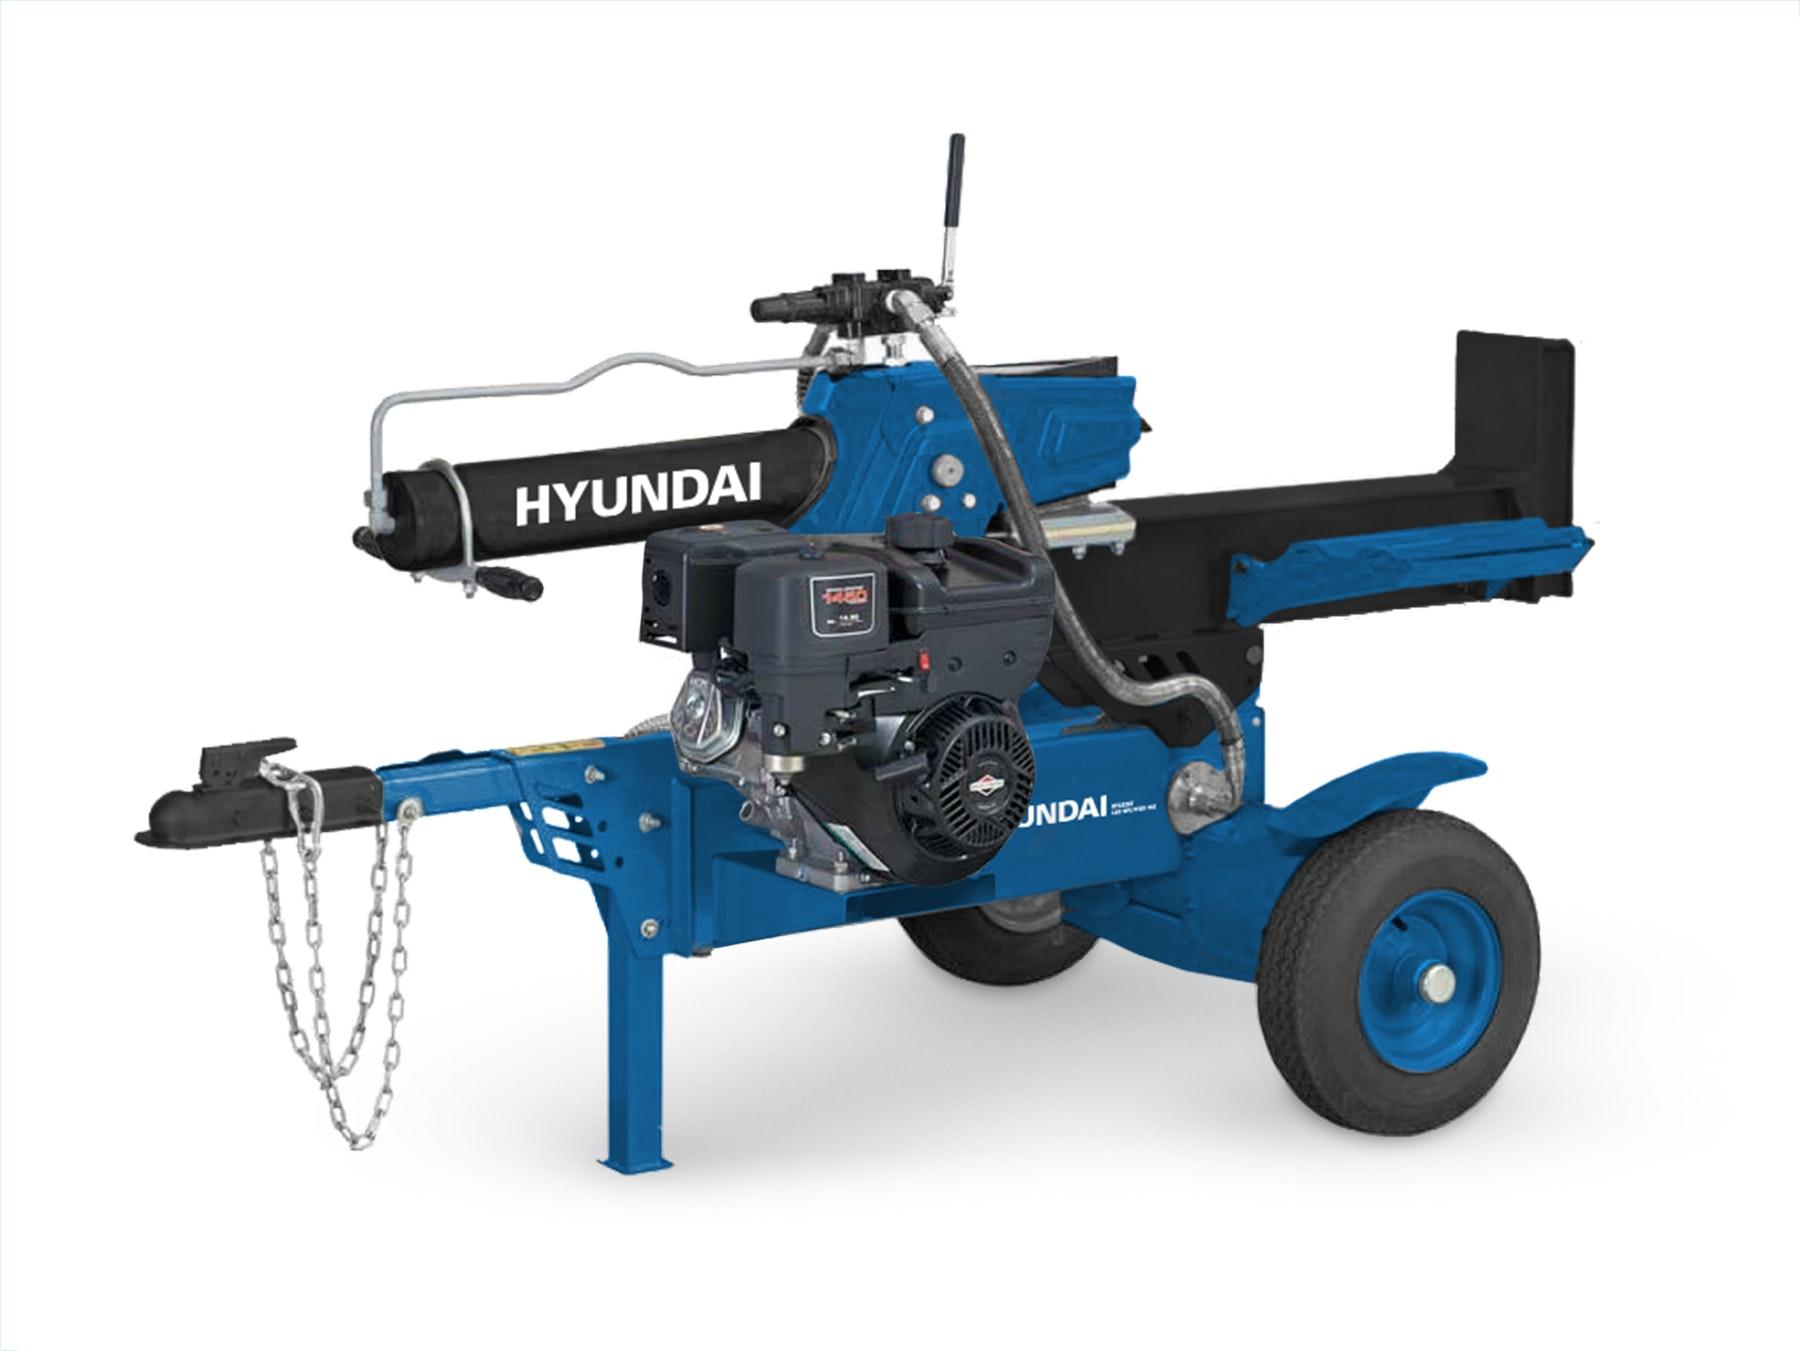 Hyundai Log Splitter 35T